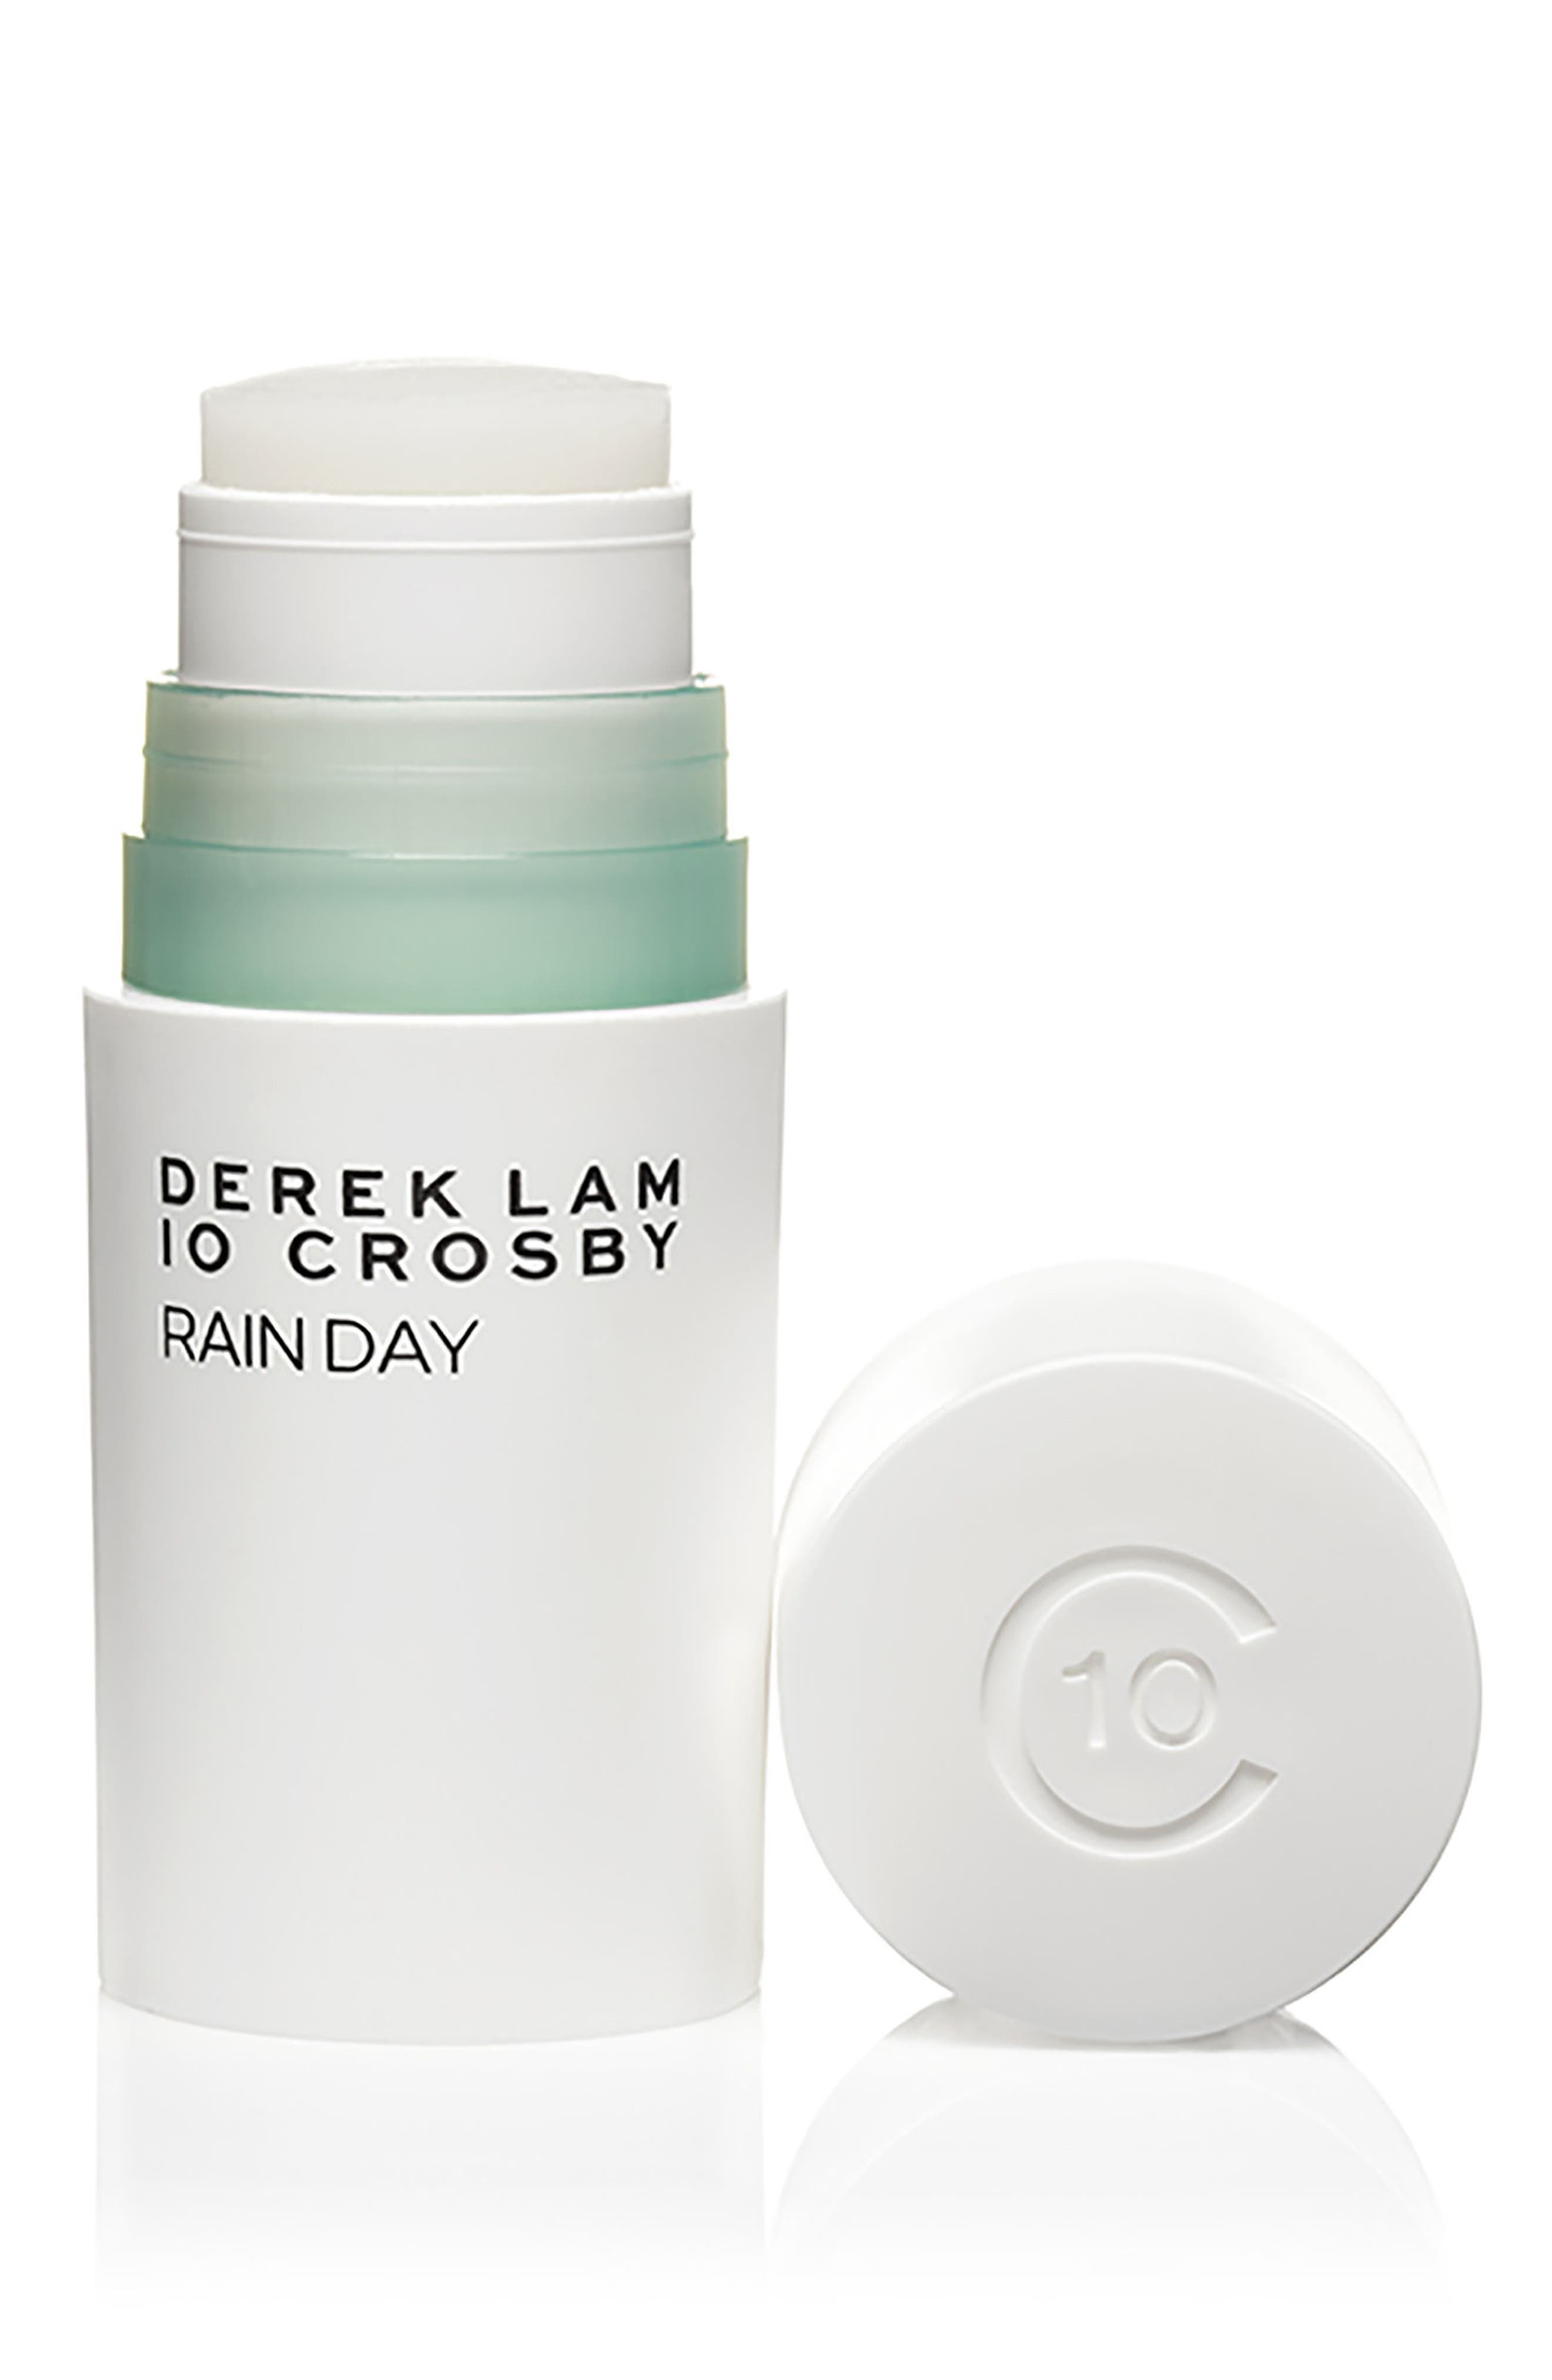 Main Image - Derek Lam 10 Crosby Rain Day Parfum Stick (Nordstrom Exclusive)